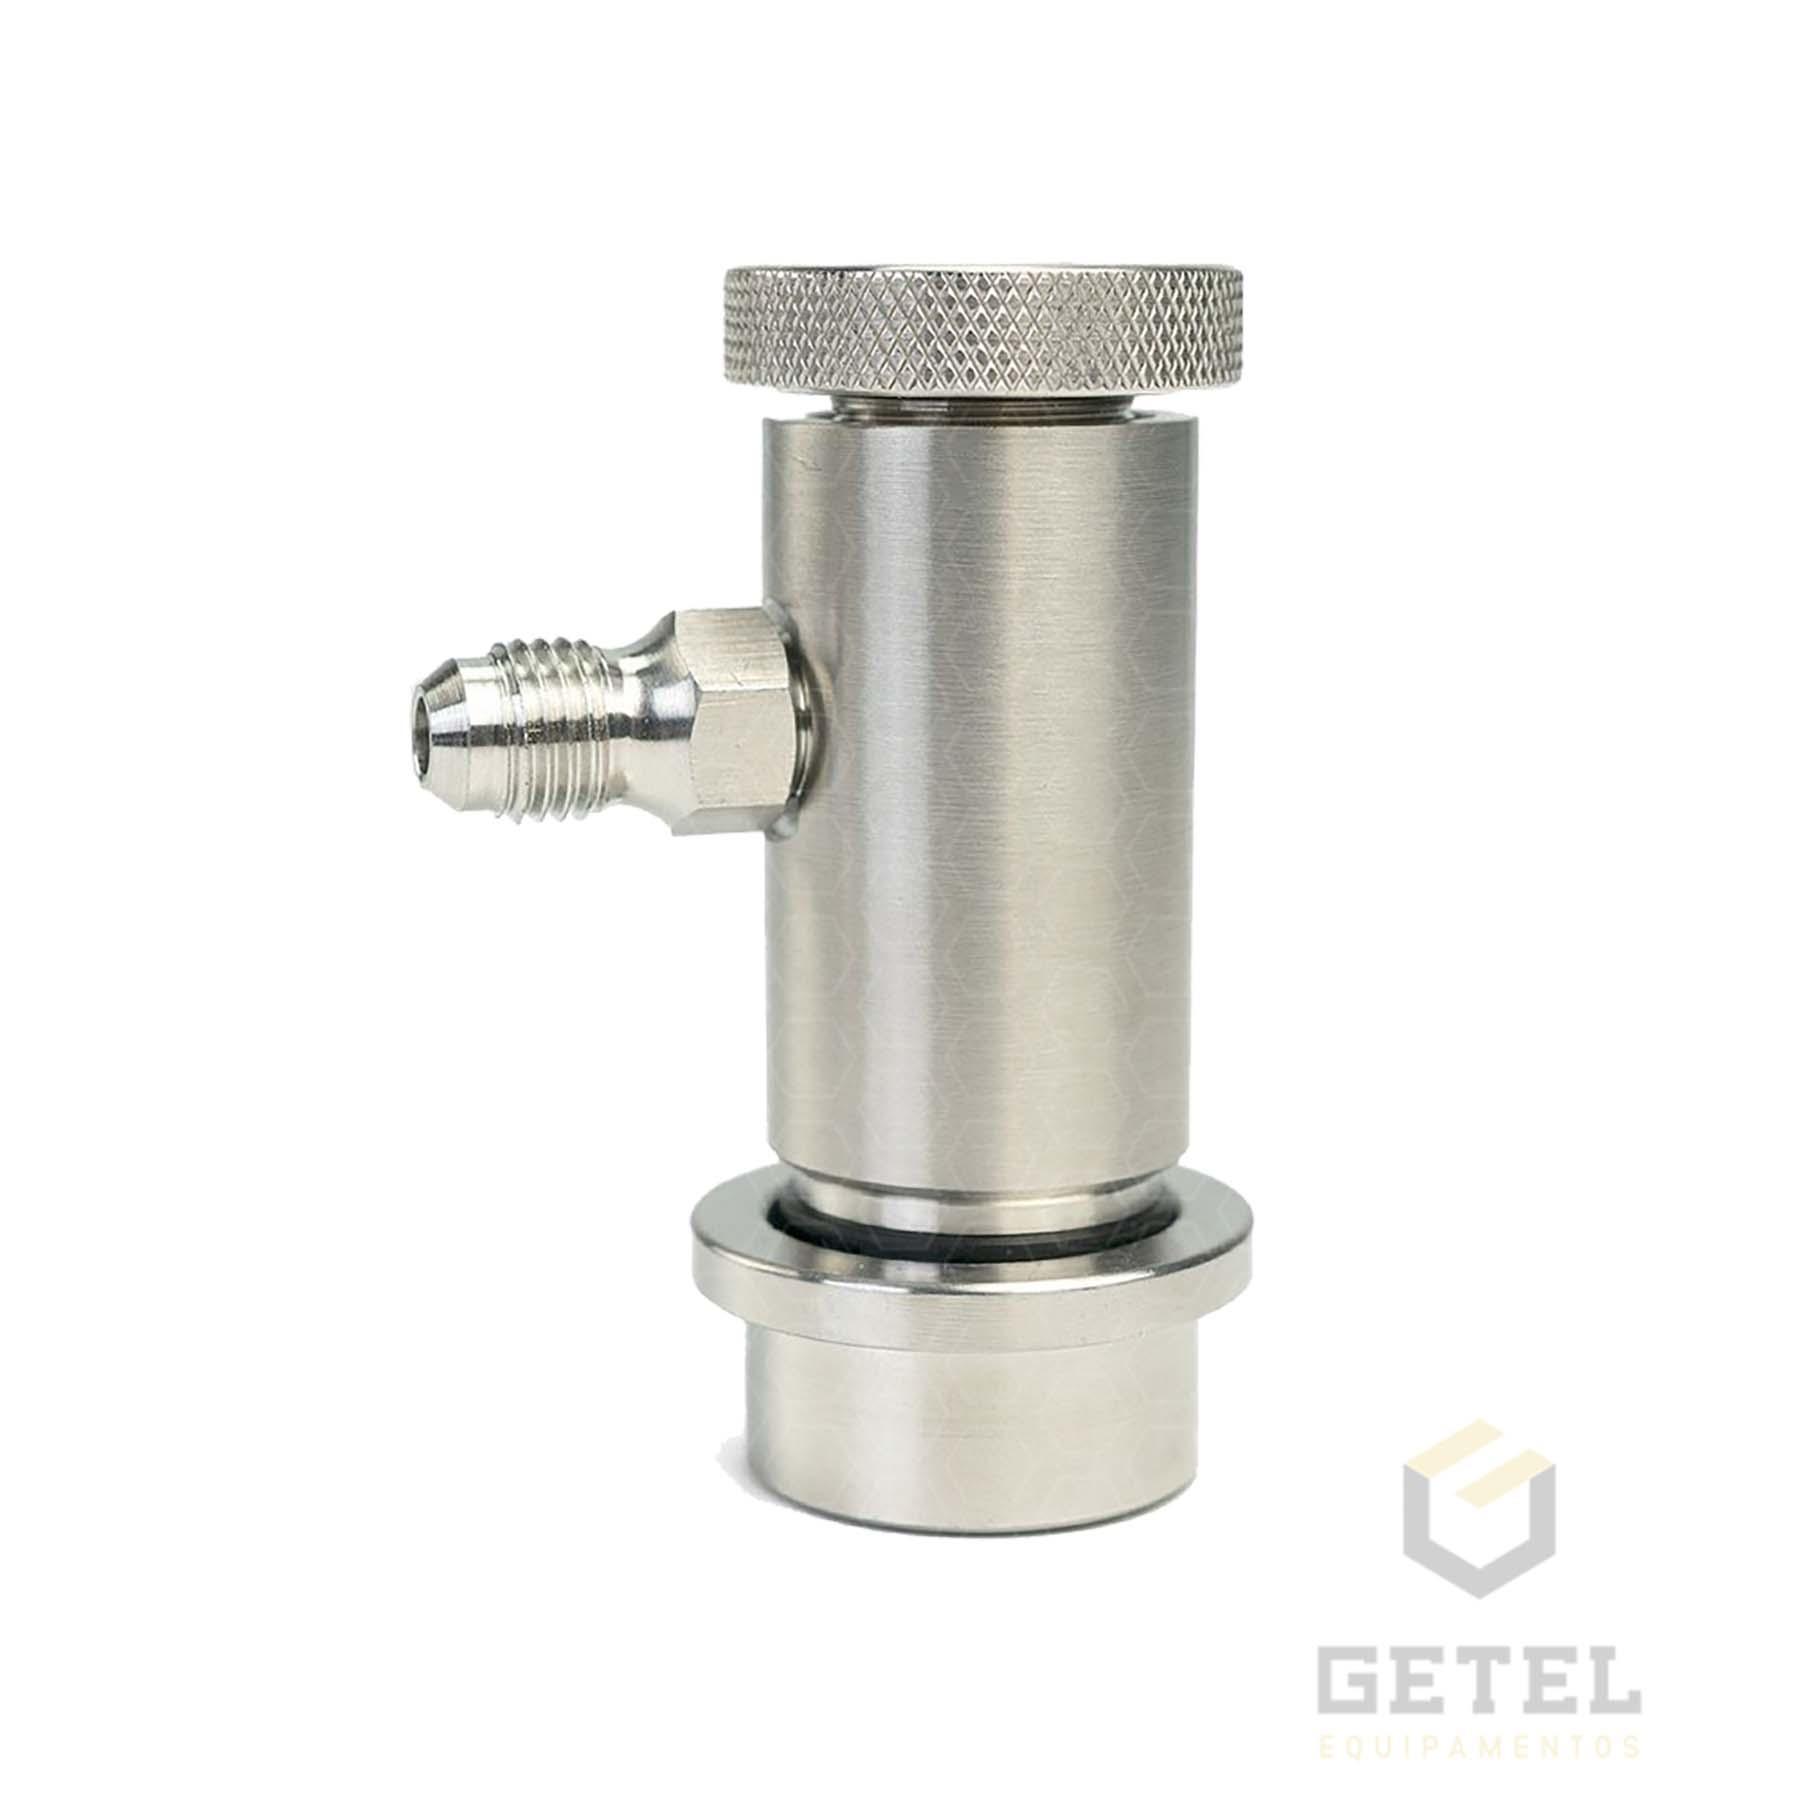 "Conector Ball-Lock para Líquido - Rosca 7/16"" - com Controle de Fluxo"